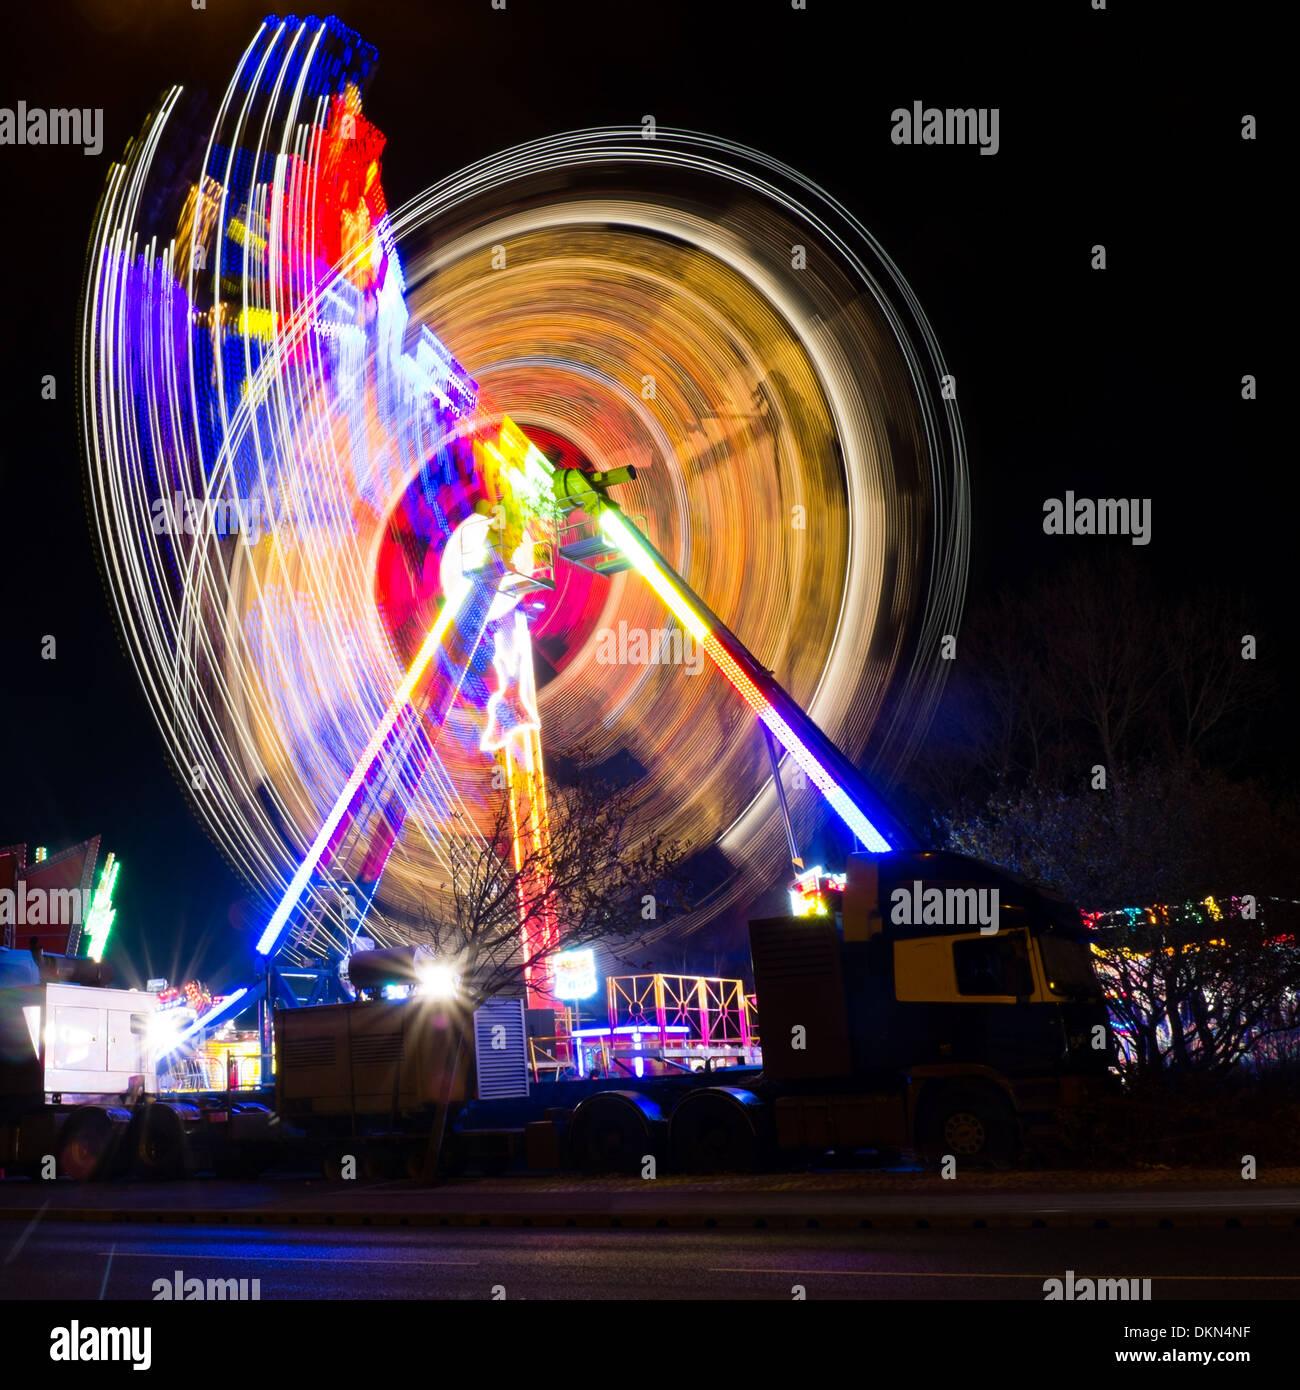 Light trails, long exposure photograph Aberystwyth Fair, Wales UK - Stock Image